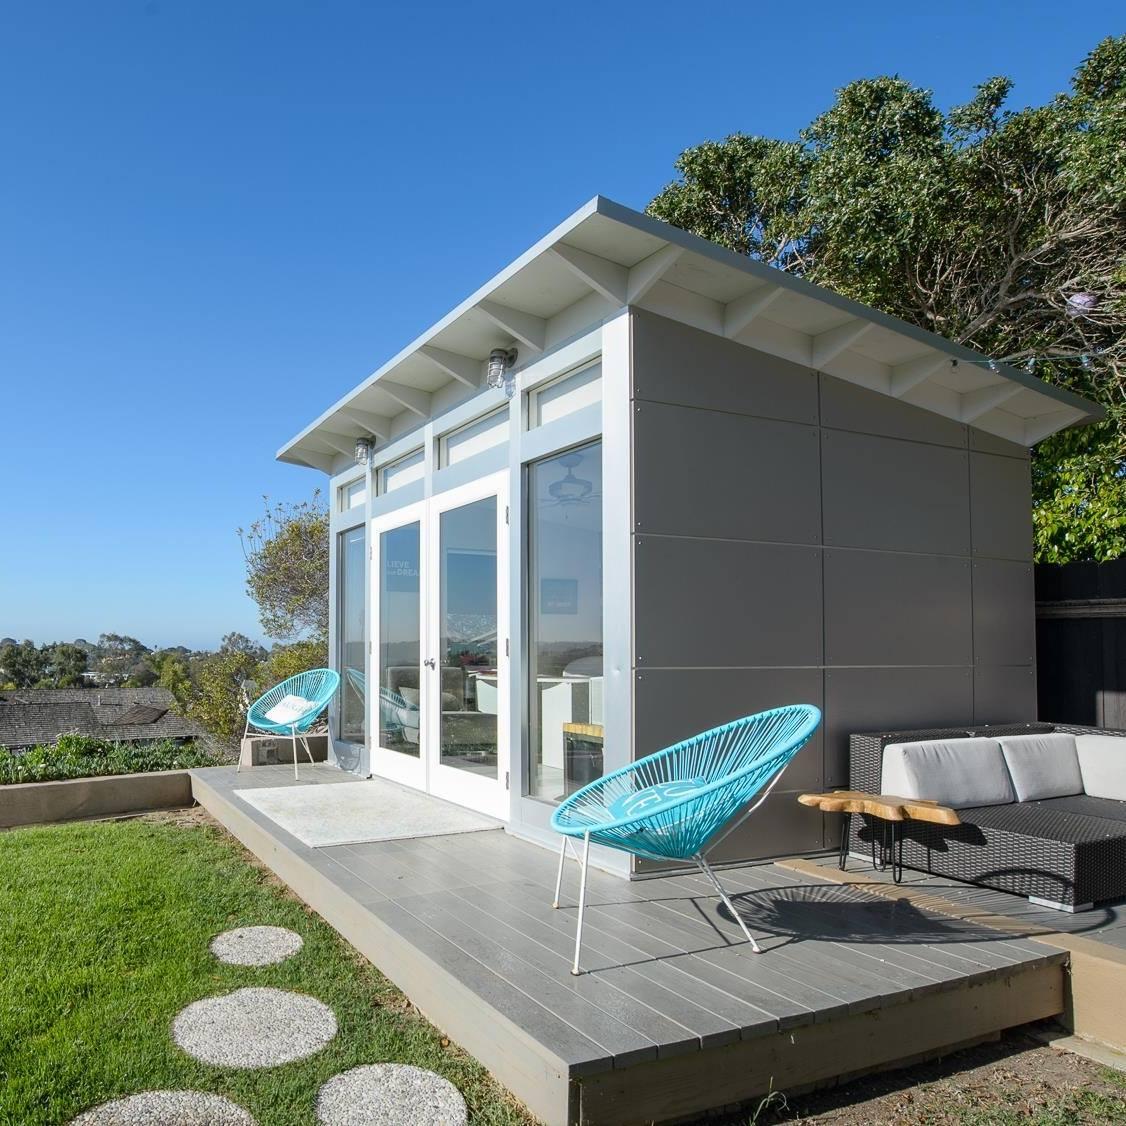 Image of a backyard Studio Shed